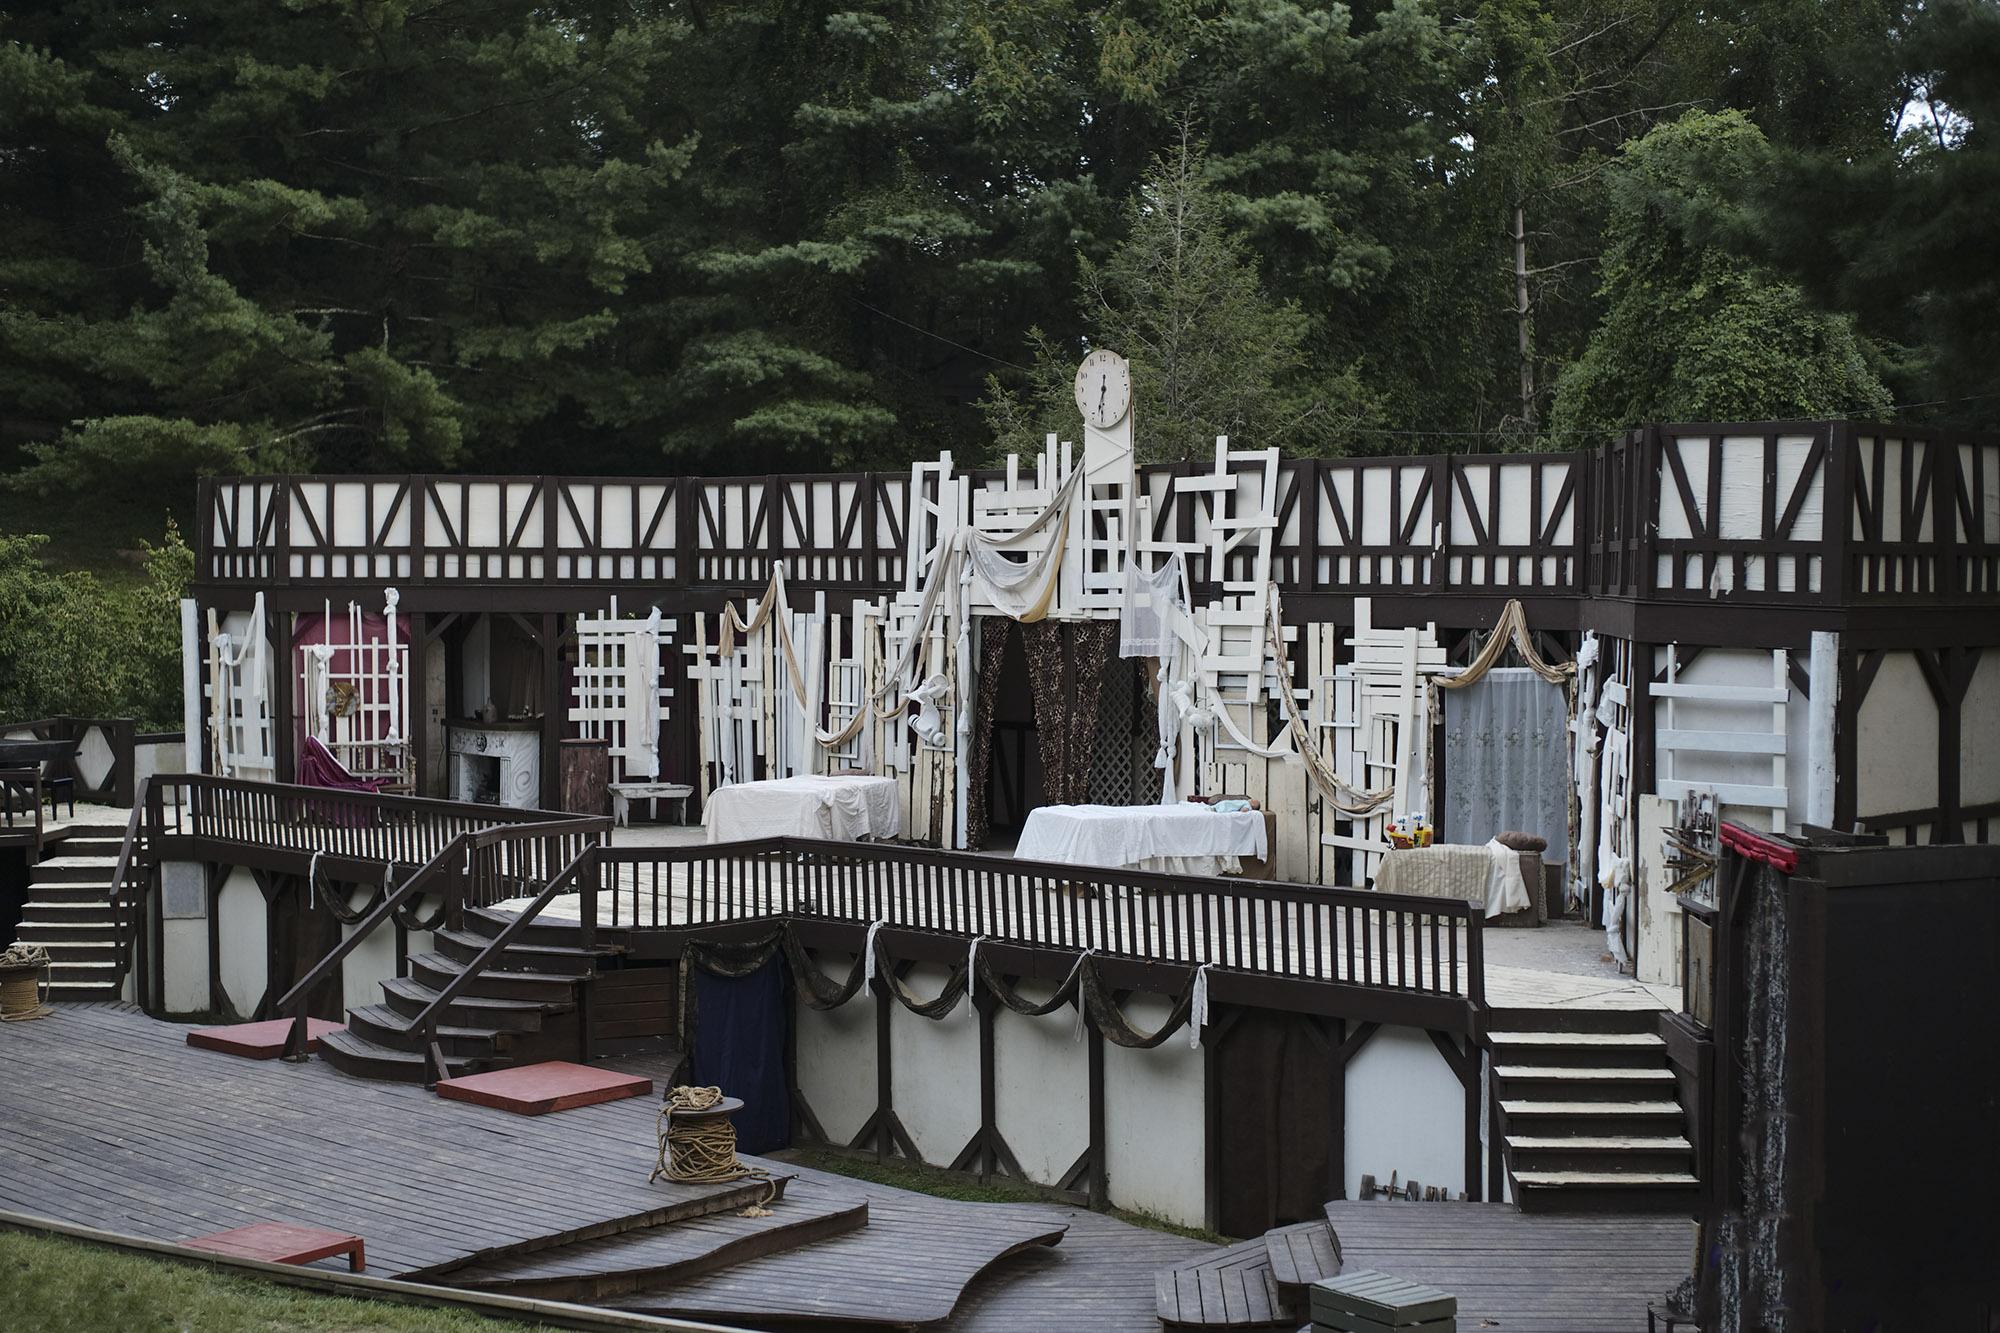 Hazel Robinson Amphitheatre